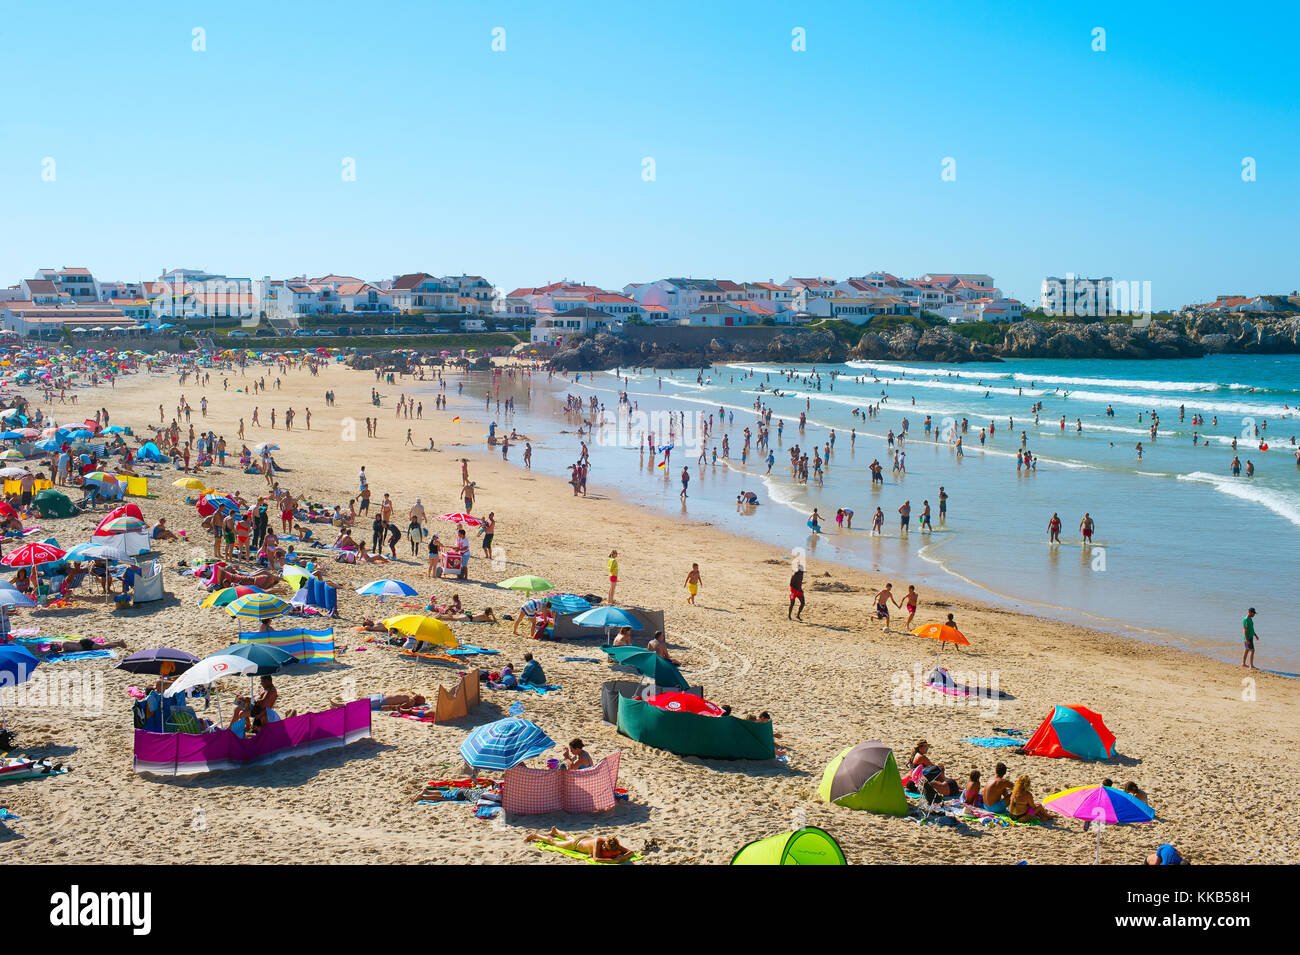 BALEAL, PORTUGAL - JUL 30, 2017: Crowded ocean beach in a high peak season. Portugal famous tourist destination - Stock Image